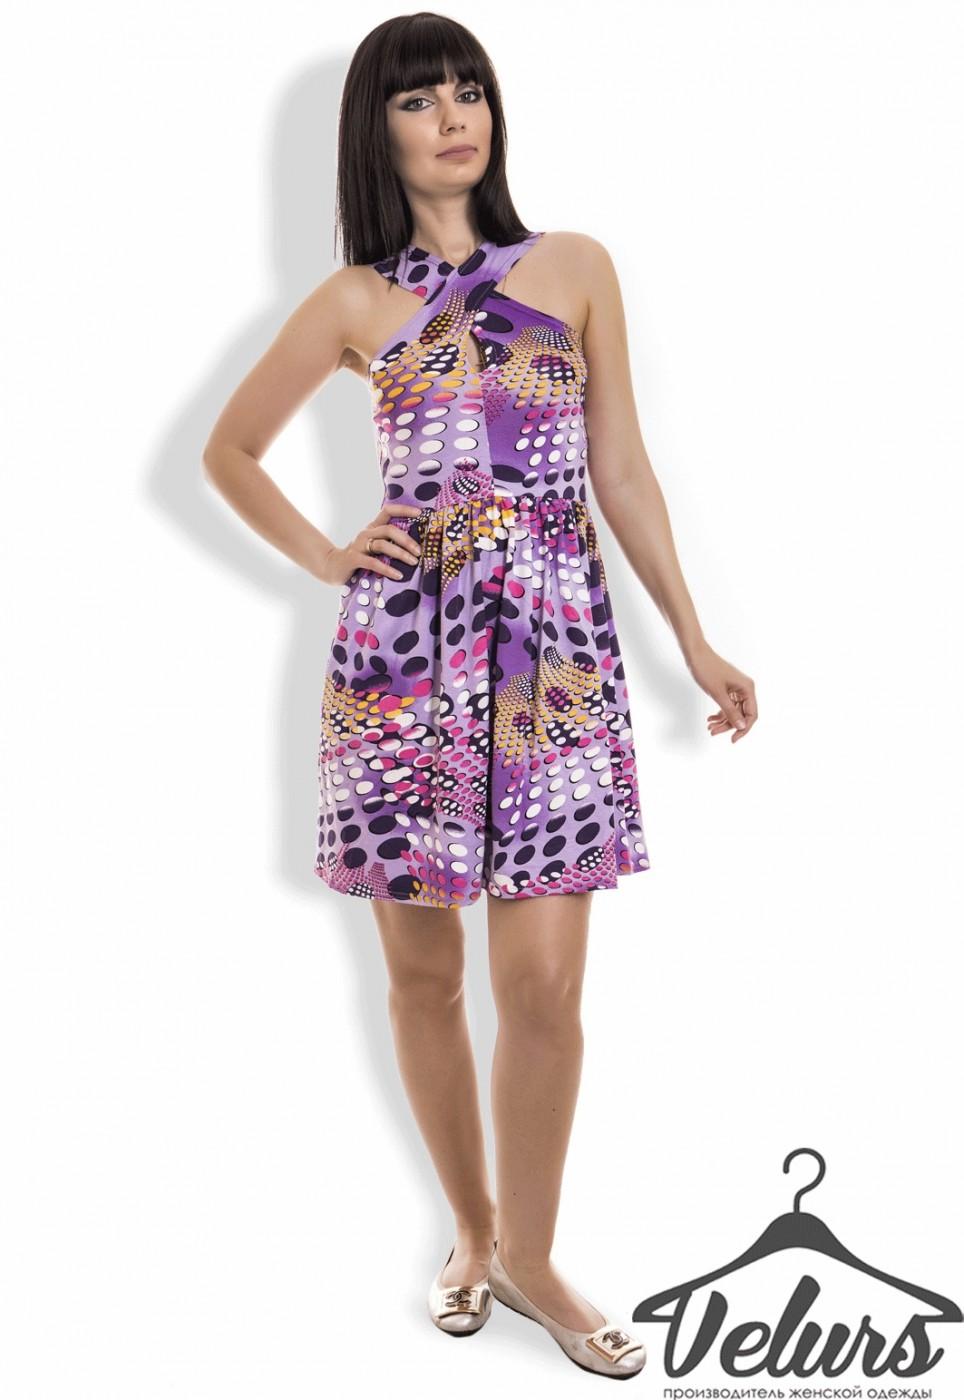 Velurs: Платье 21962 - фото 1